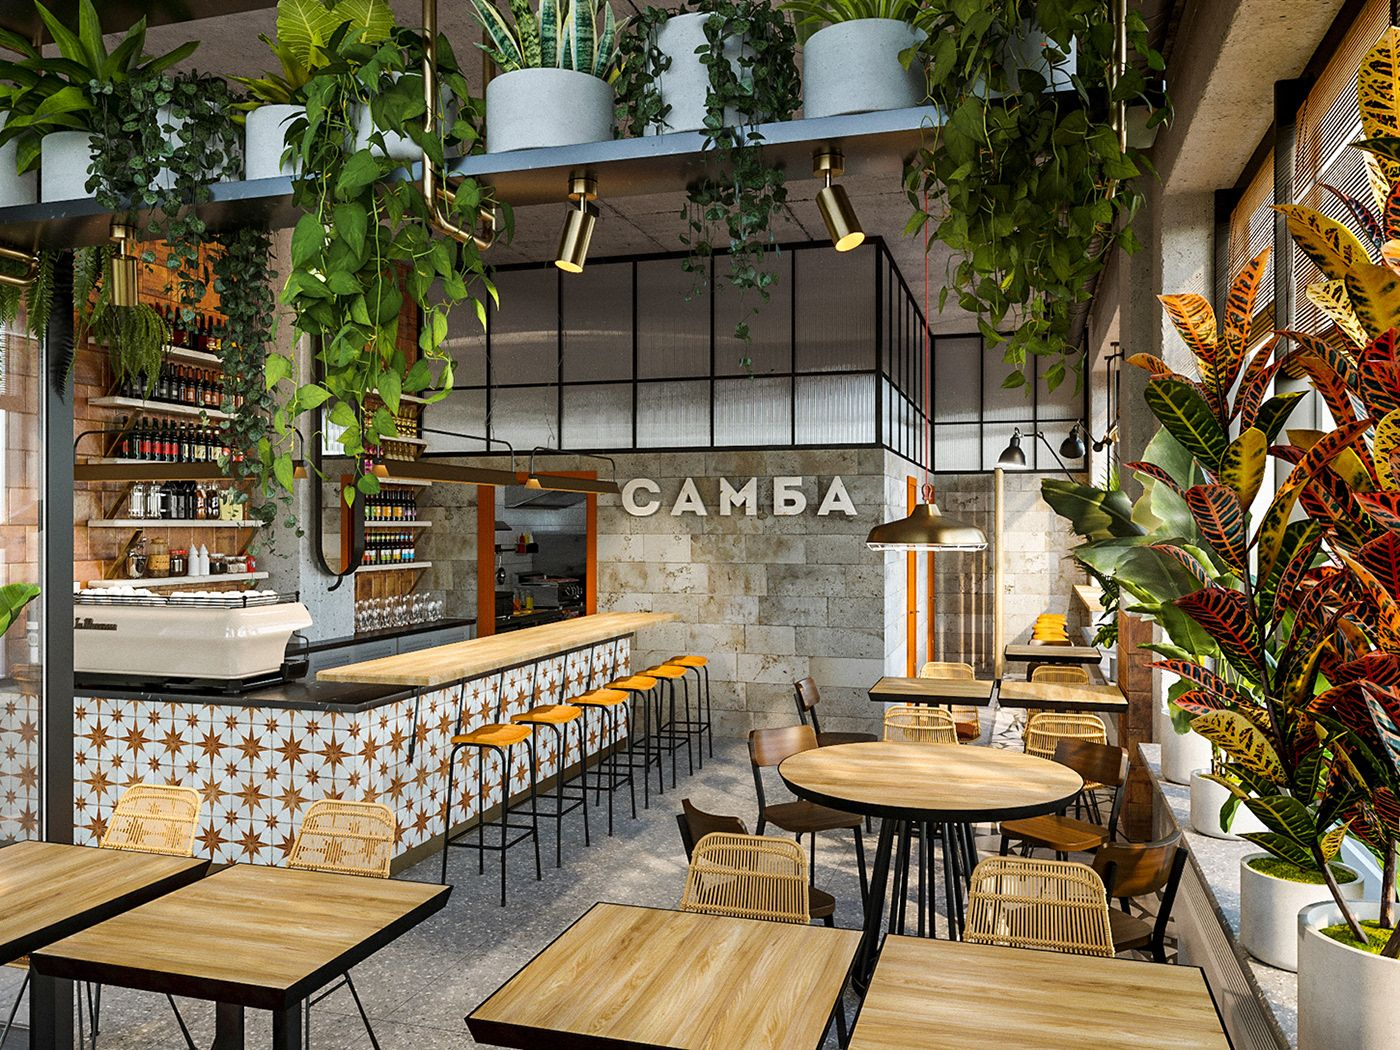 Samba Cafe Interior On Behance Bistro Interior Cafe Interior Restaurant Interior Design